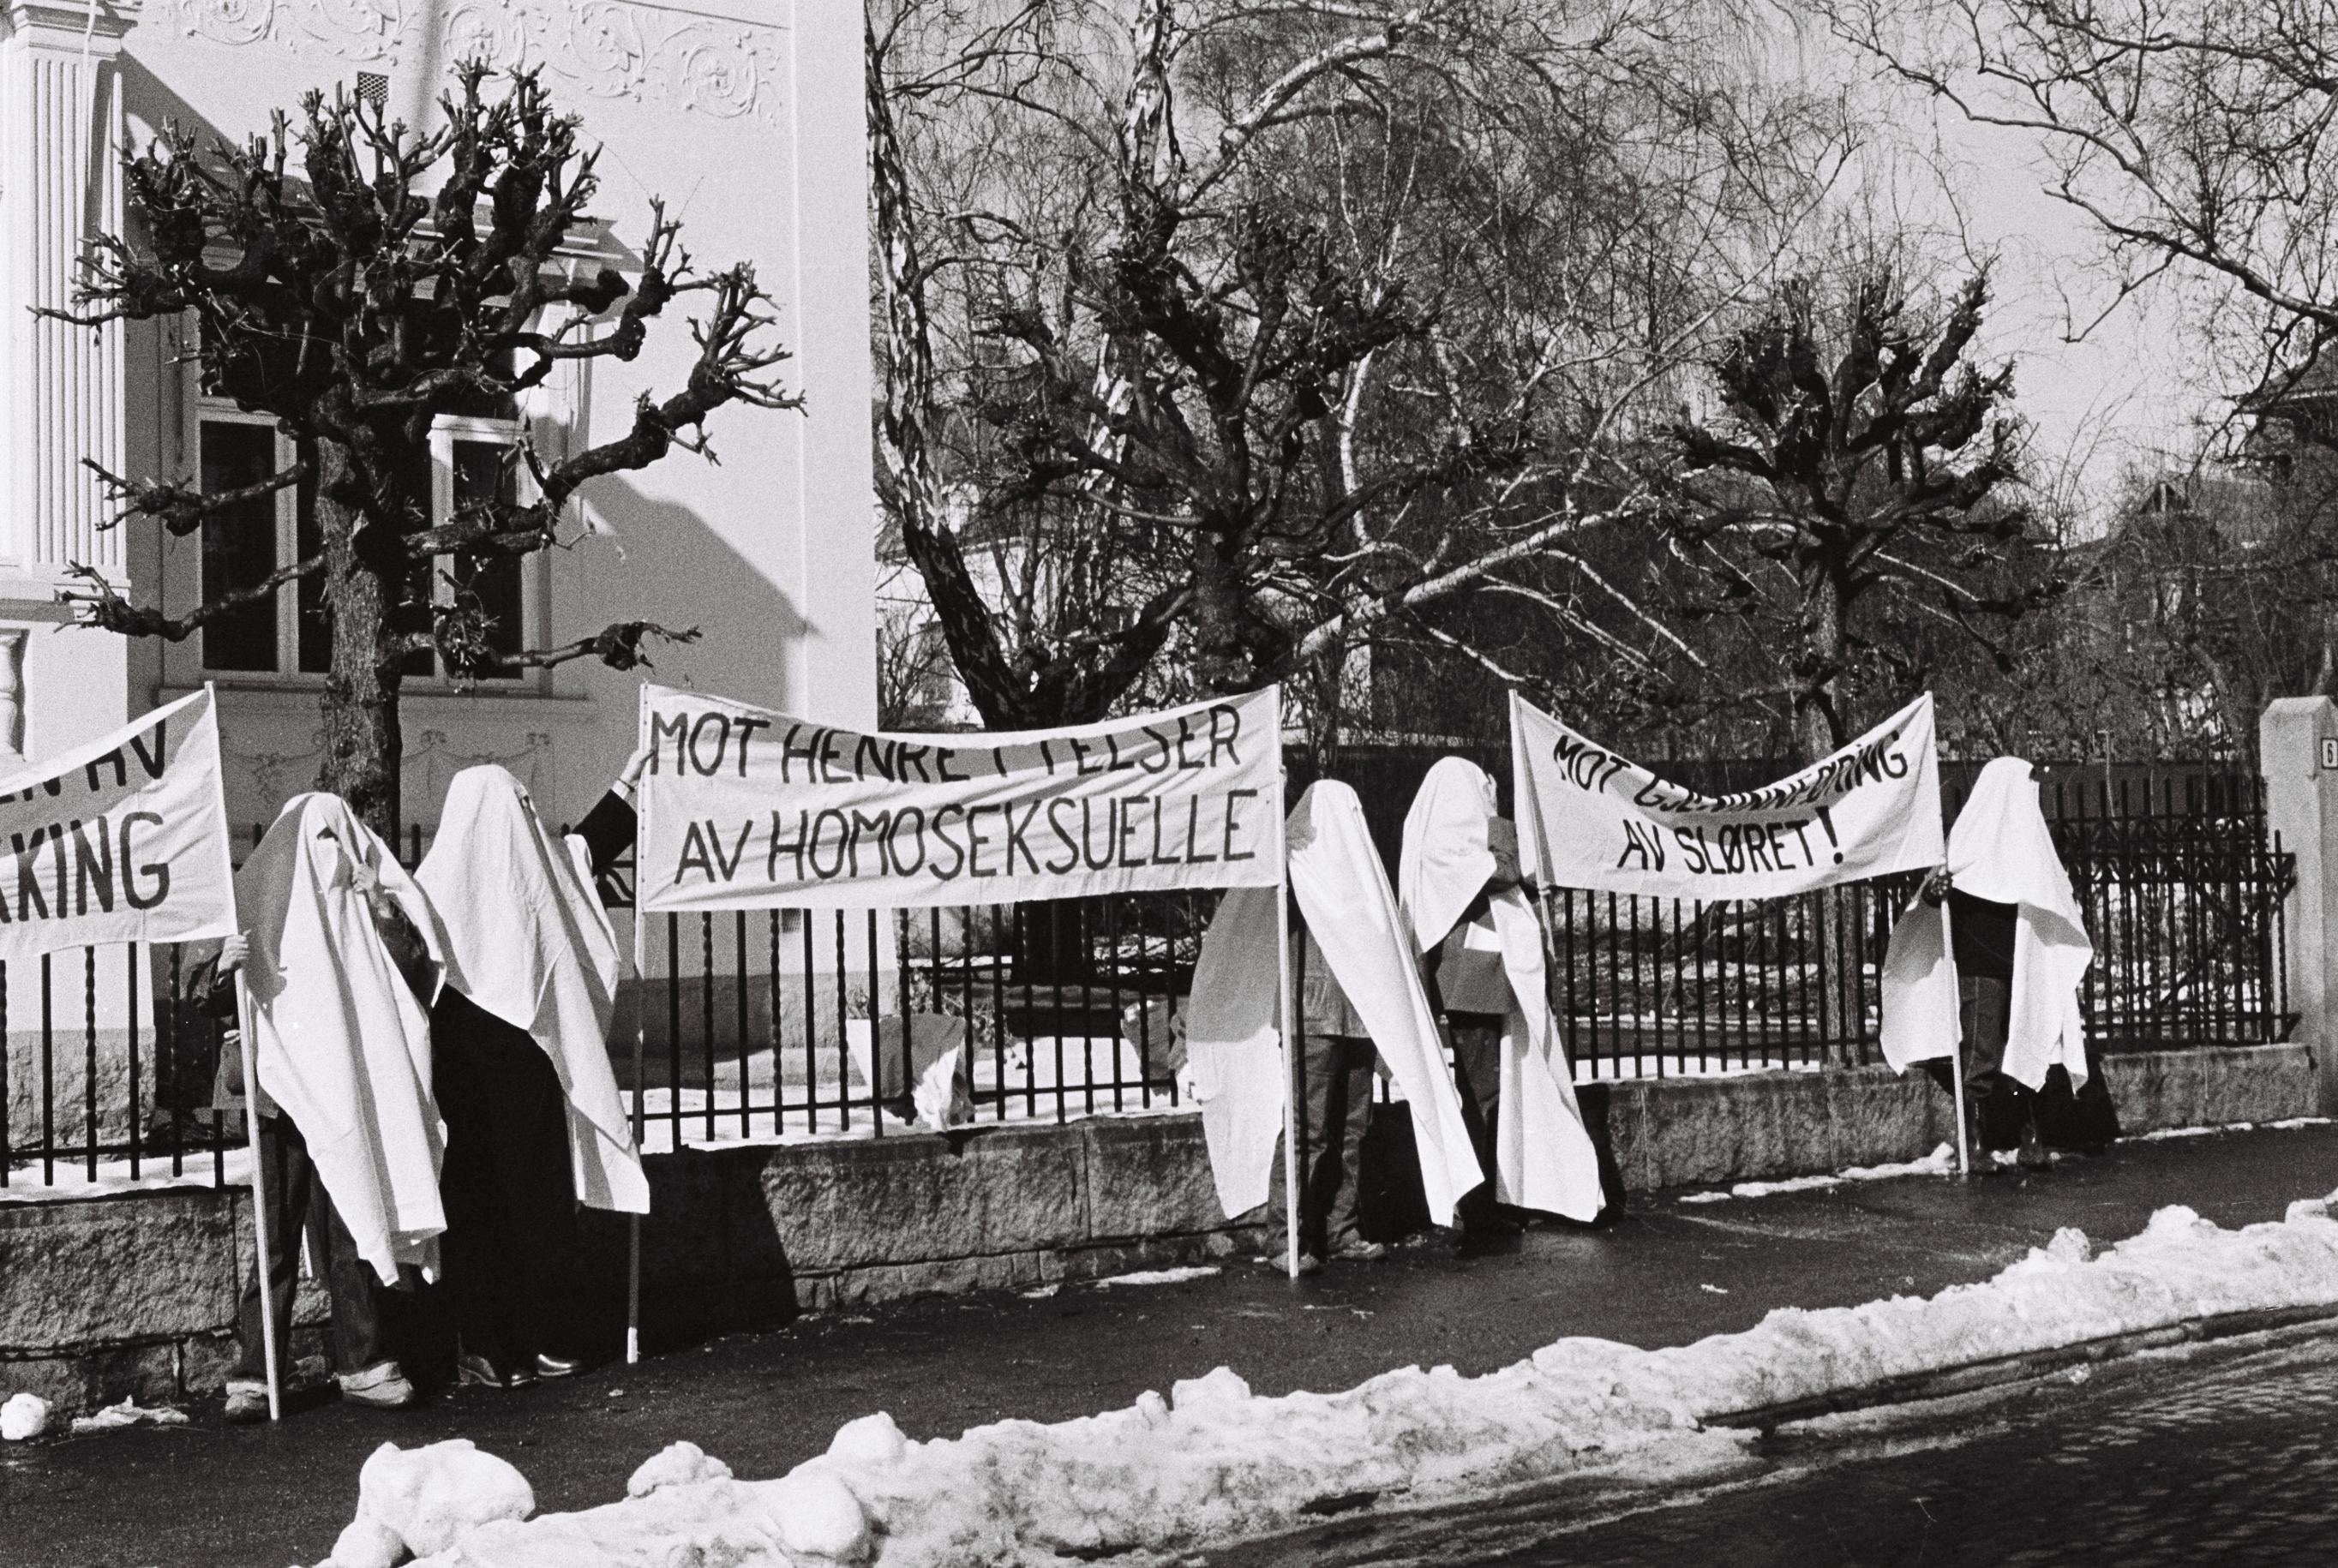 punktdemonstrasjon foran den Iranske ambassaden i Oslo